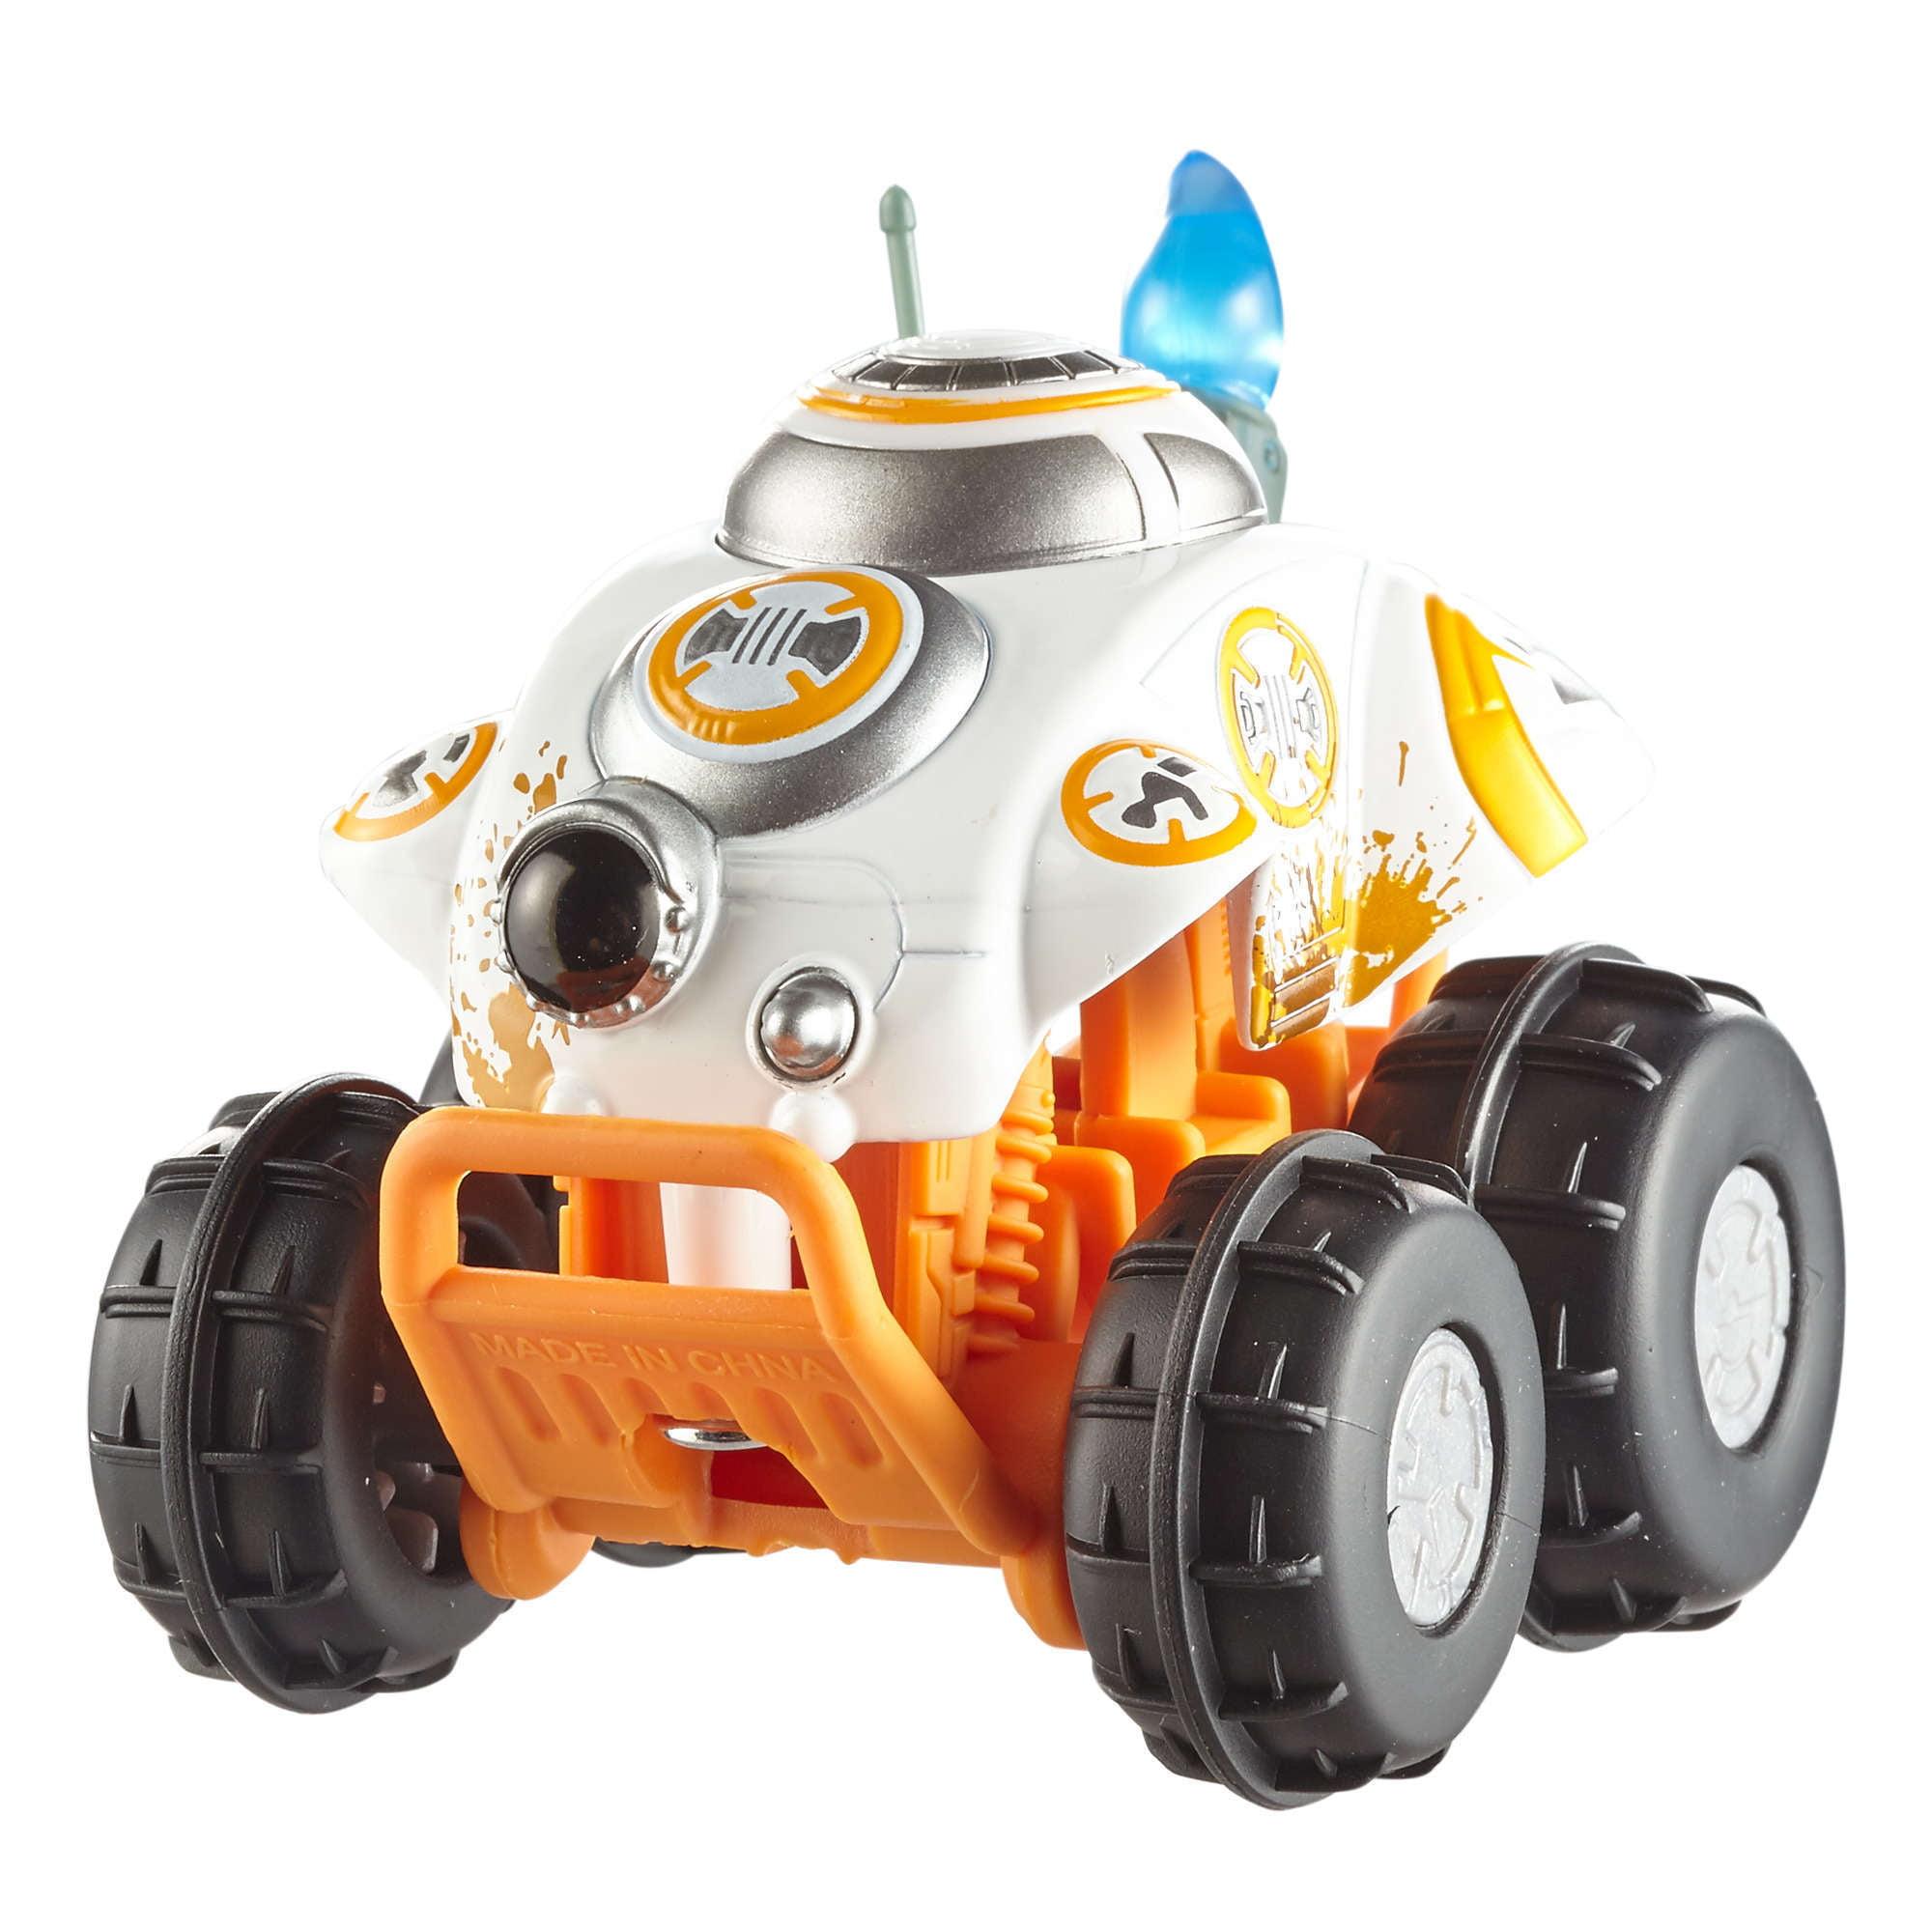 Hot Wheels Star Wars All-Terrain BB-8 1:43 Scale Vehicle by Mattel